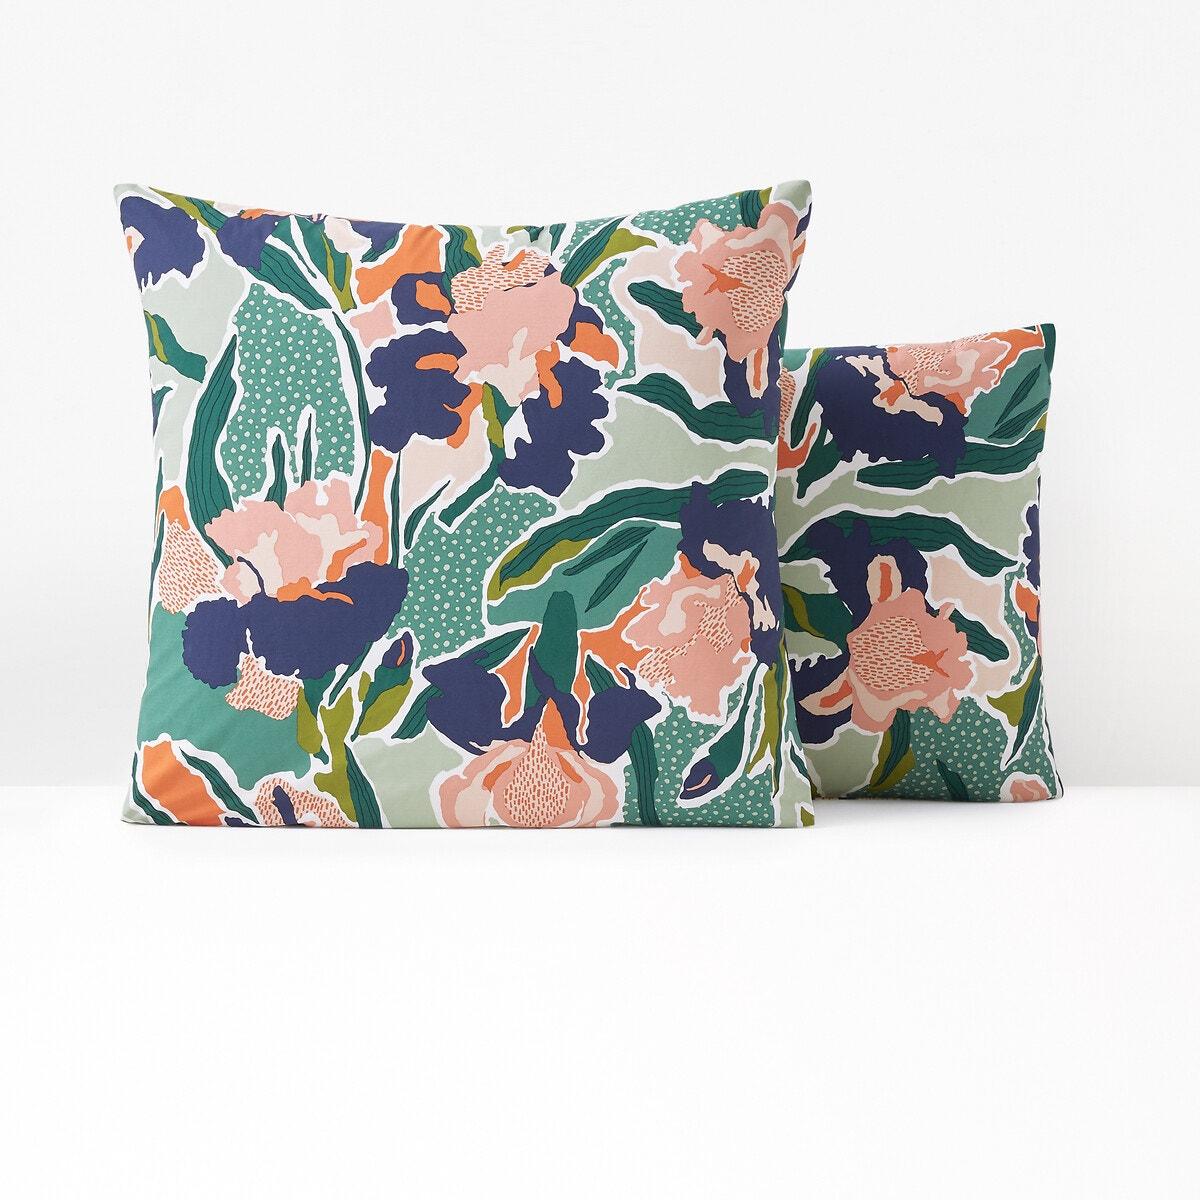 Bonnie コットンパーケル 枕カバー